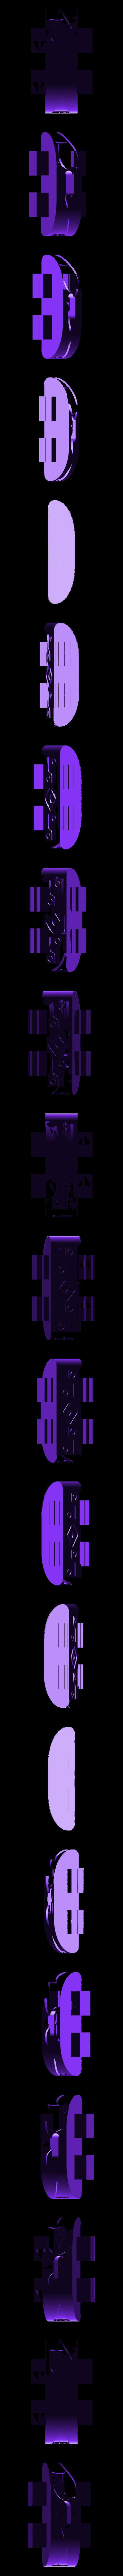 UpLid-dockingPart.stl Download free STL file Prayer wheel (With frame) • 3D printing template, NickChung